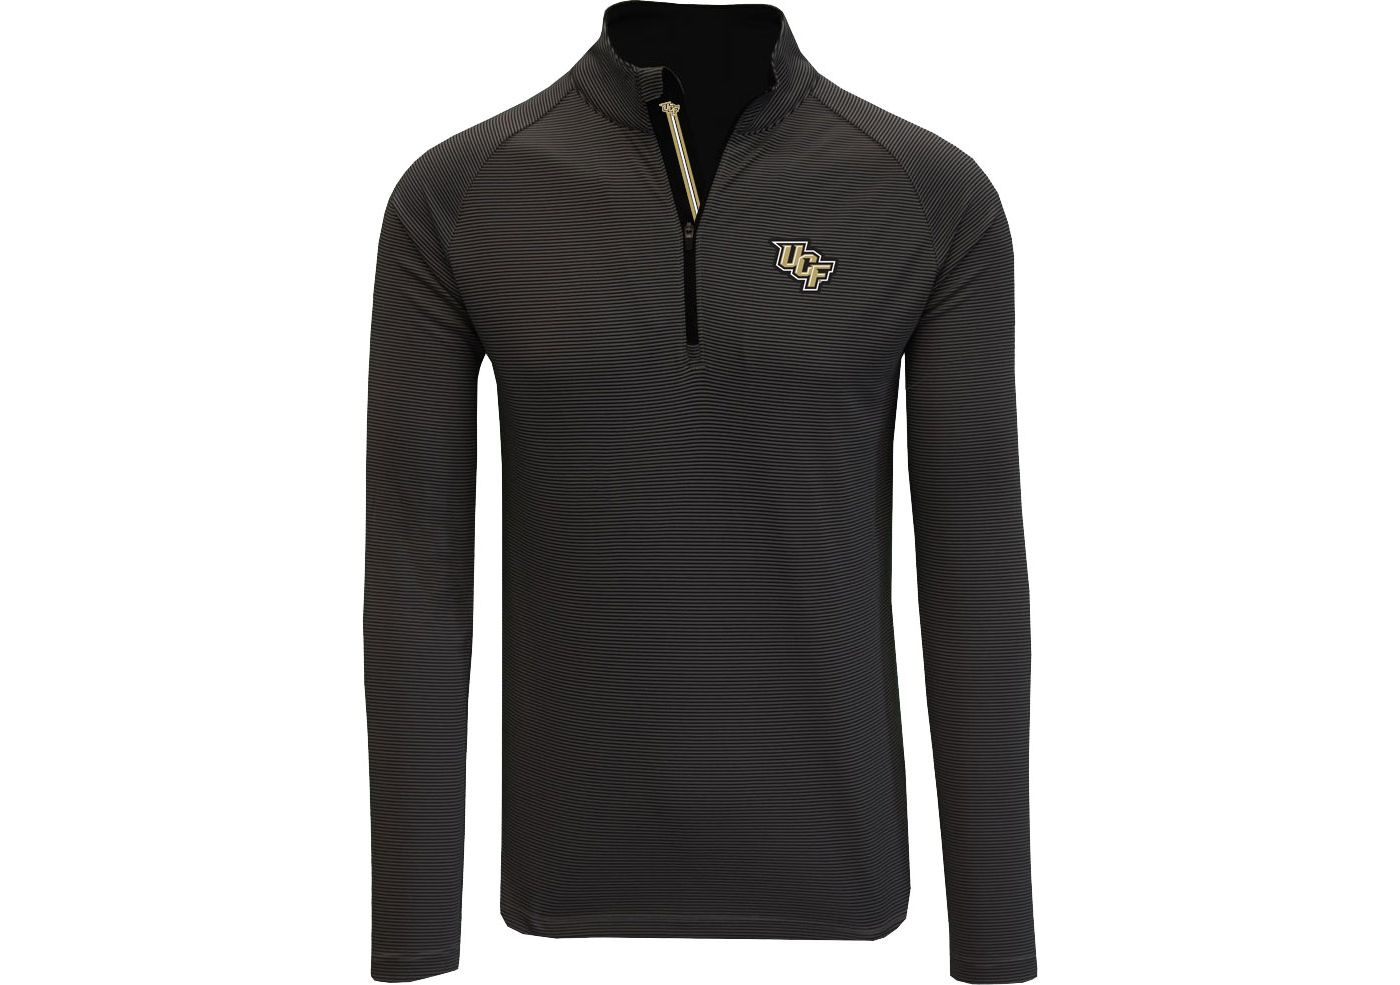 Levelwear Men's UCF Knights Orion Quarter-Zip Black Shirt